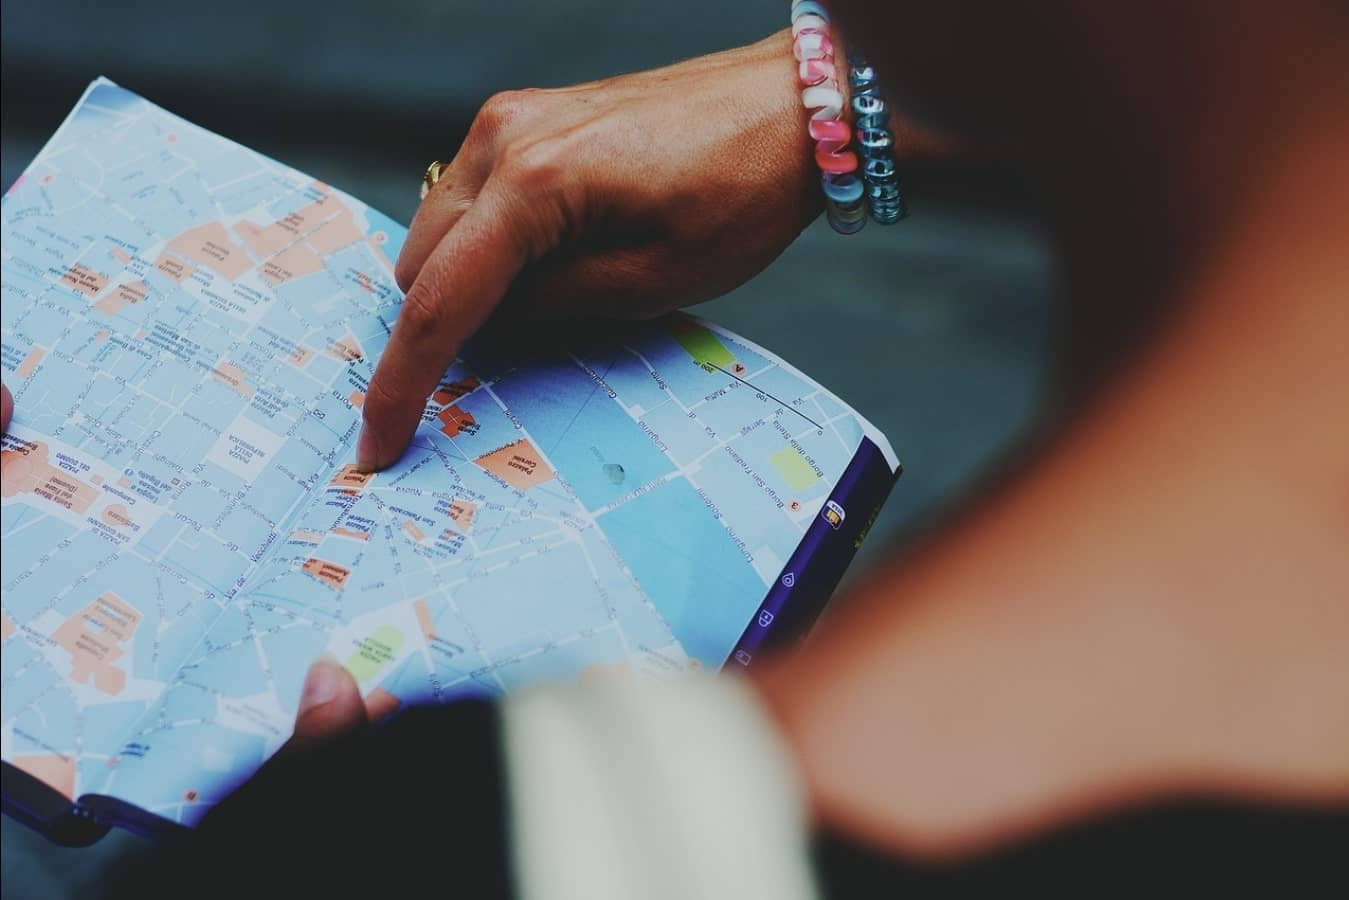 Contoh Surat Lamaran Pekerjaan Untuk Hiburan dan Wisata